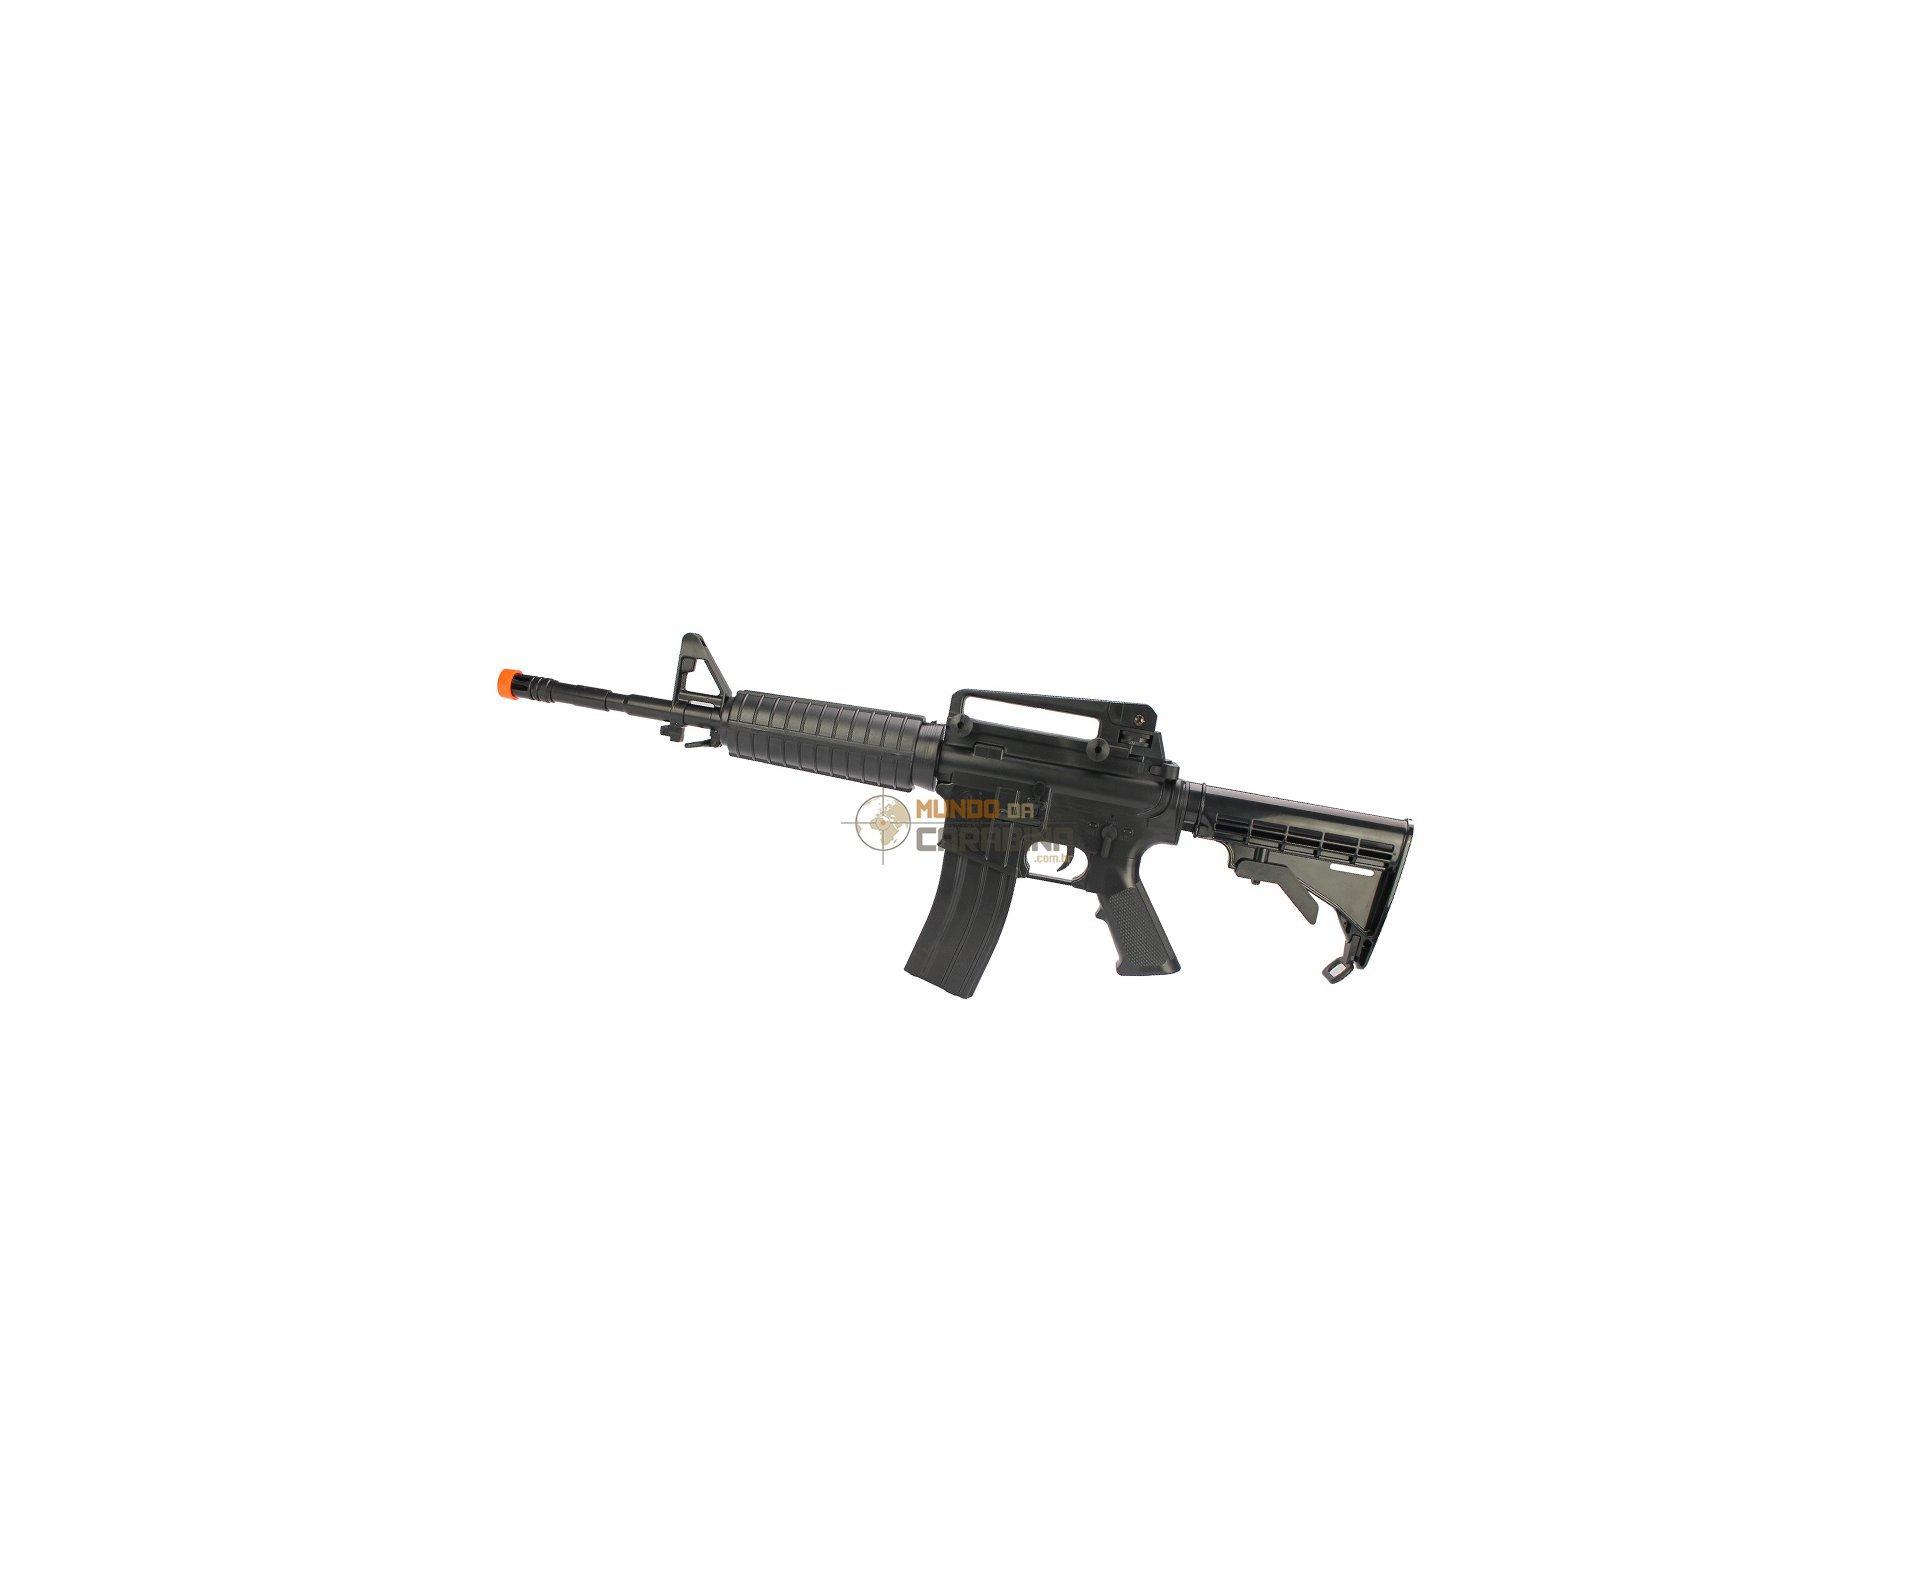 Rifle De Airsoft Colt M4a1 - Spring - Calibre 6,0 Mm - Cyber Gun